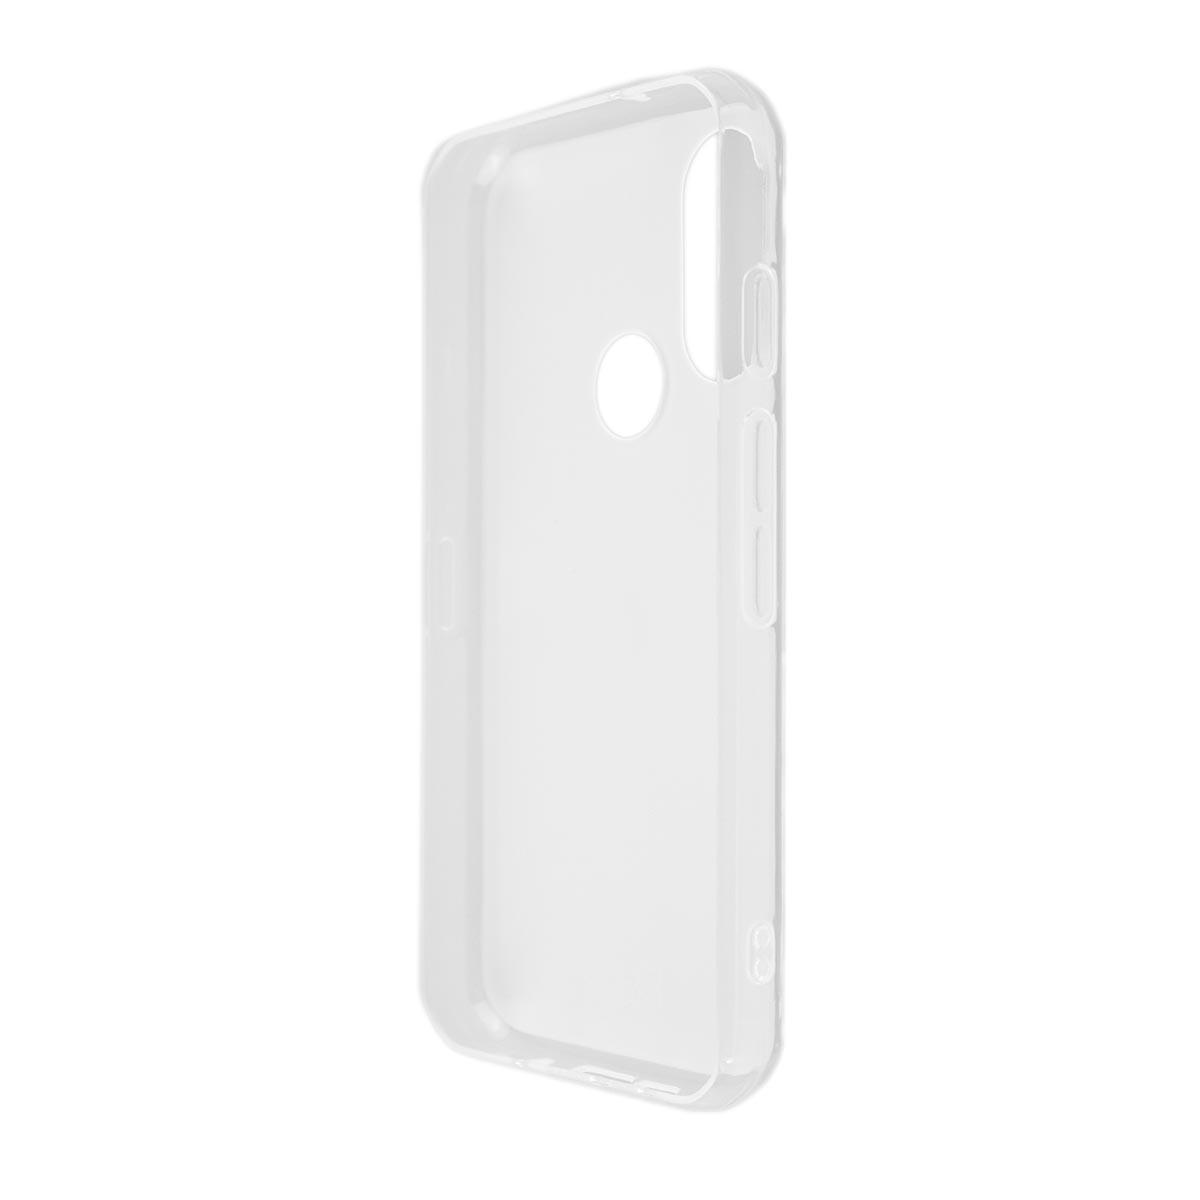 Caseroxx-TPU-Case-pour-Cat-S62-Pro-fait-de-TPU miniature 32